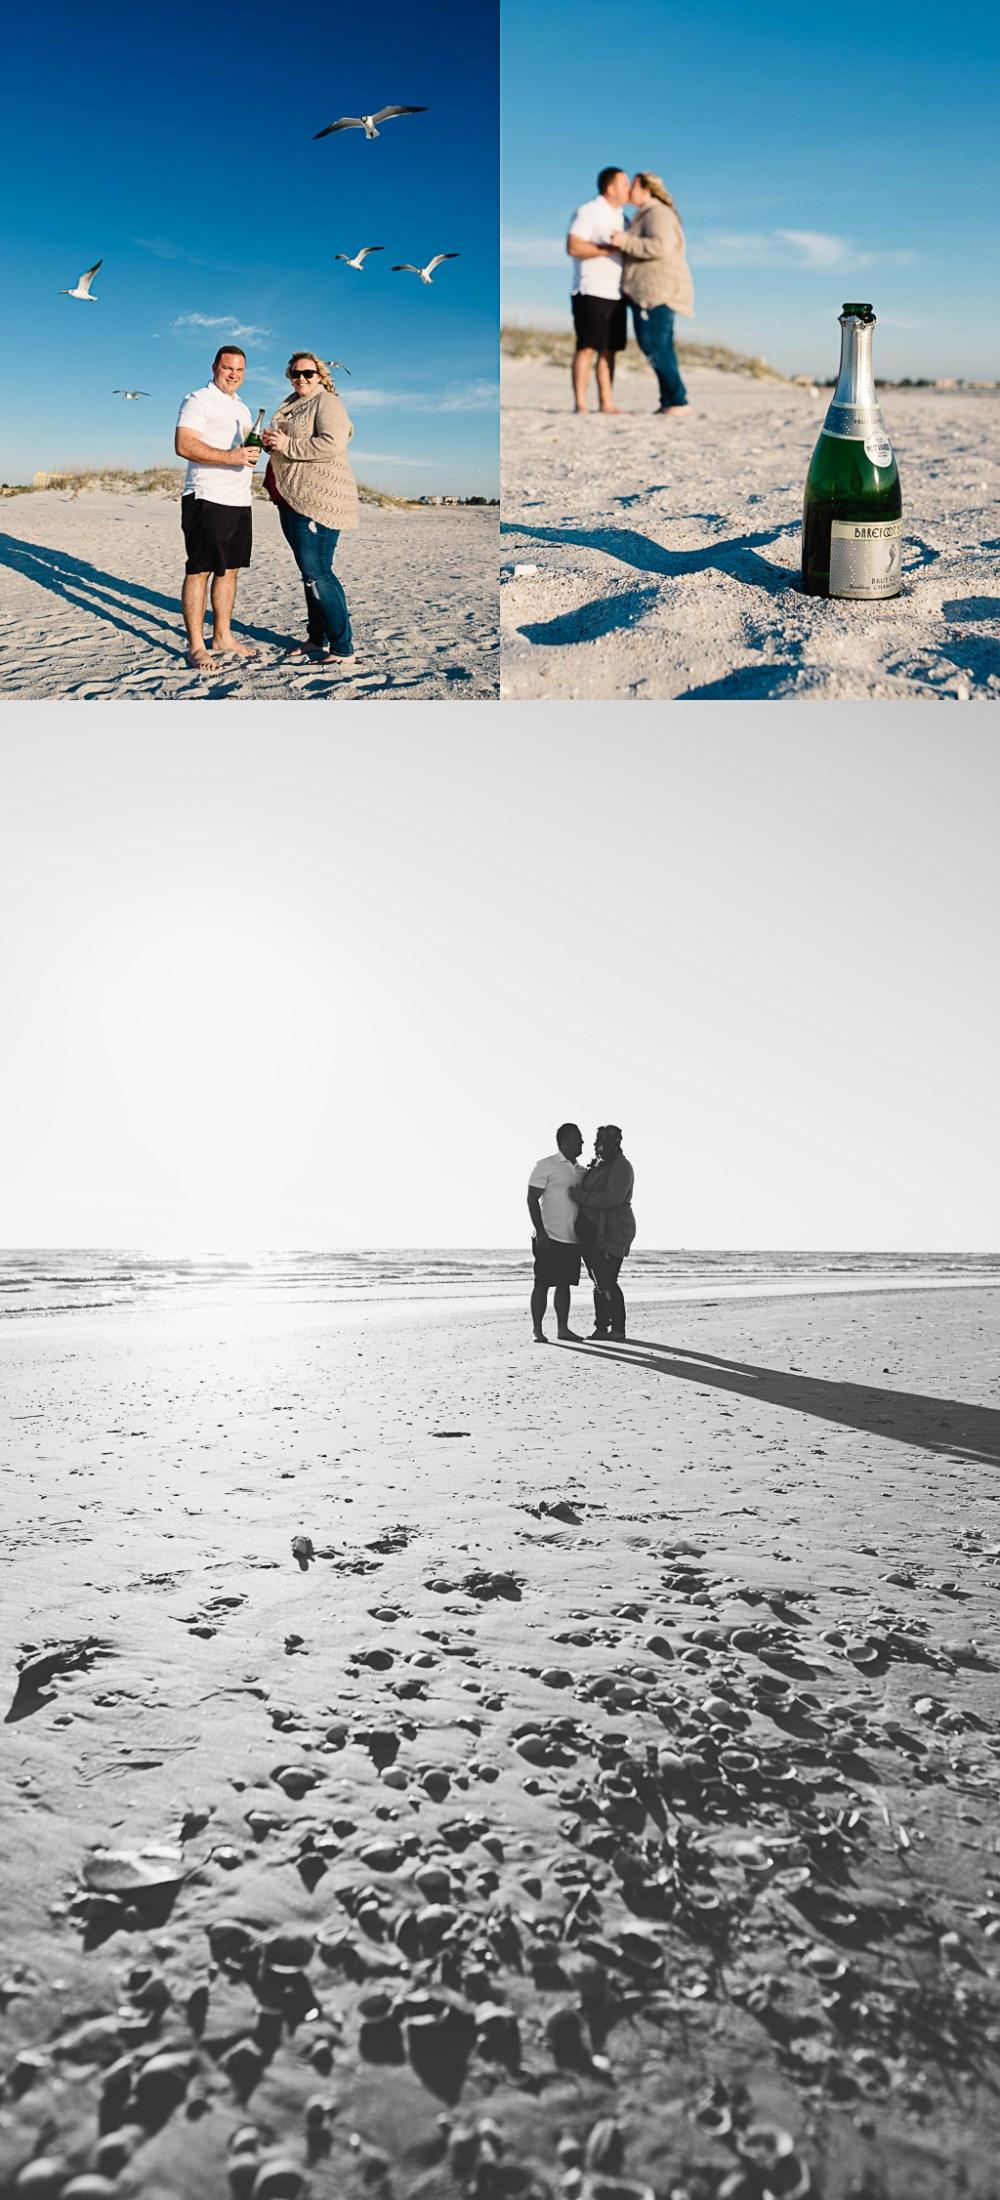 Surprise Beach Wedding Proposal | St Pete FL Wedding, Treasure Island Florida Wedding Photographer | St Pete Beach Florida Wedding Photographer Kristen Sloan